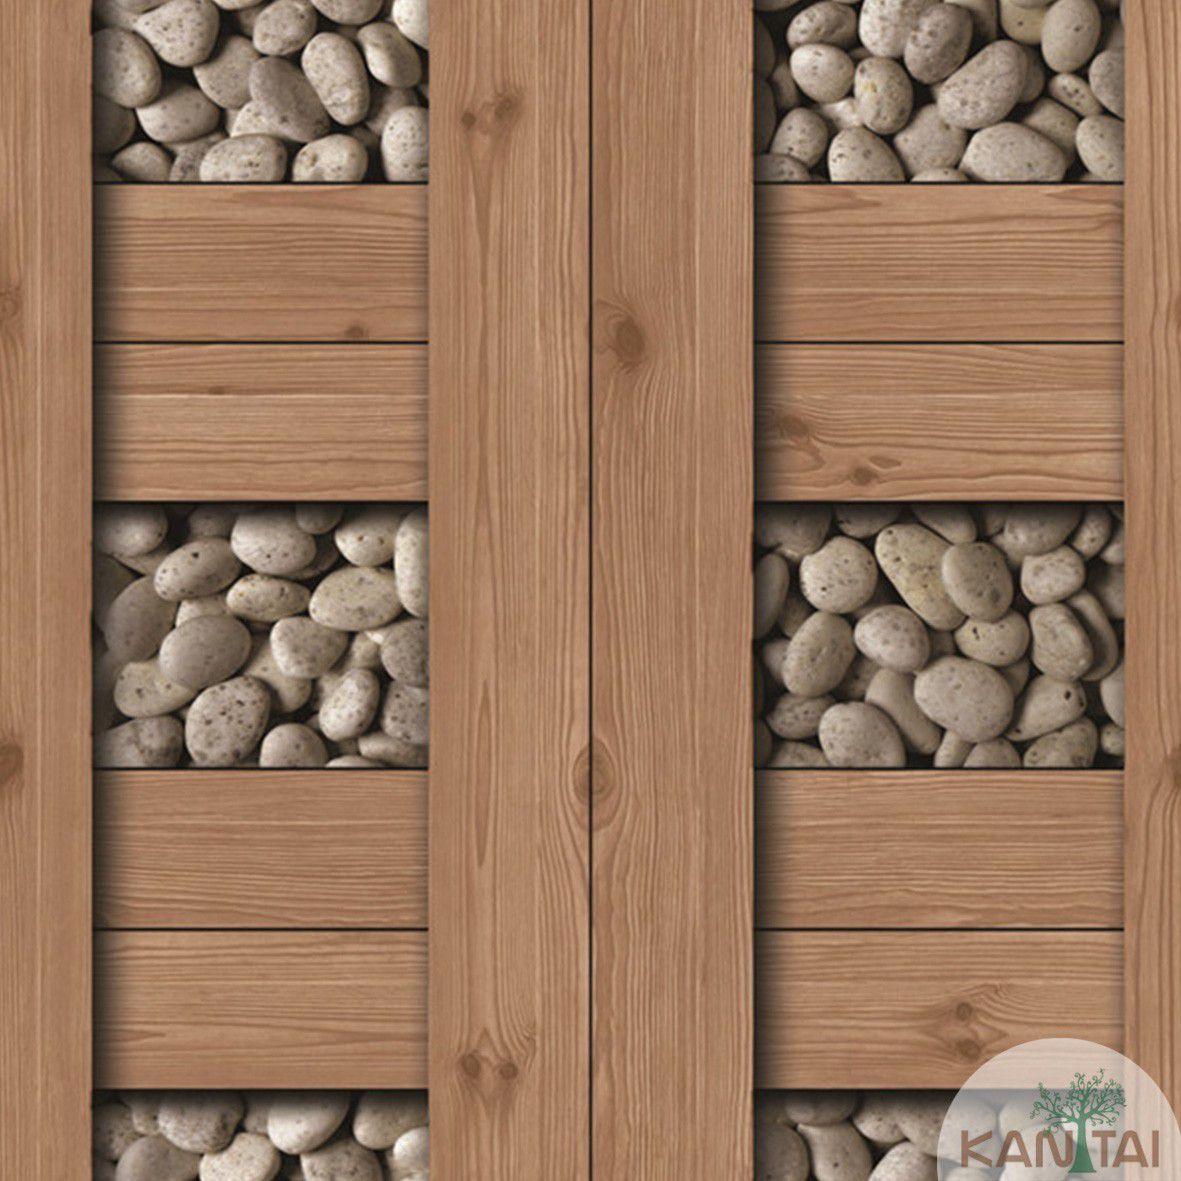 Papel de Parede  Kan Tai  Vinilico Coleção Neonature III Tábuas, Pedras Marrom, Branco